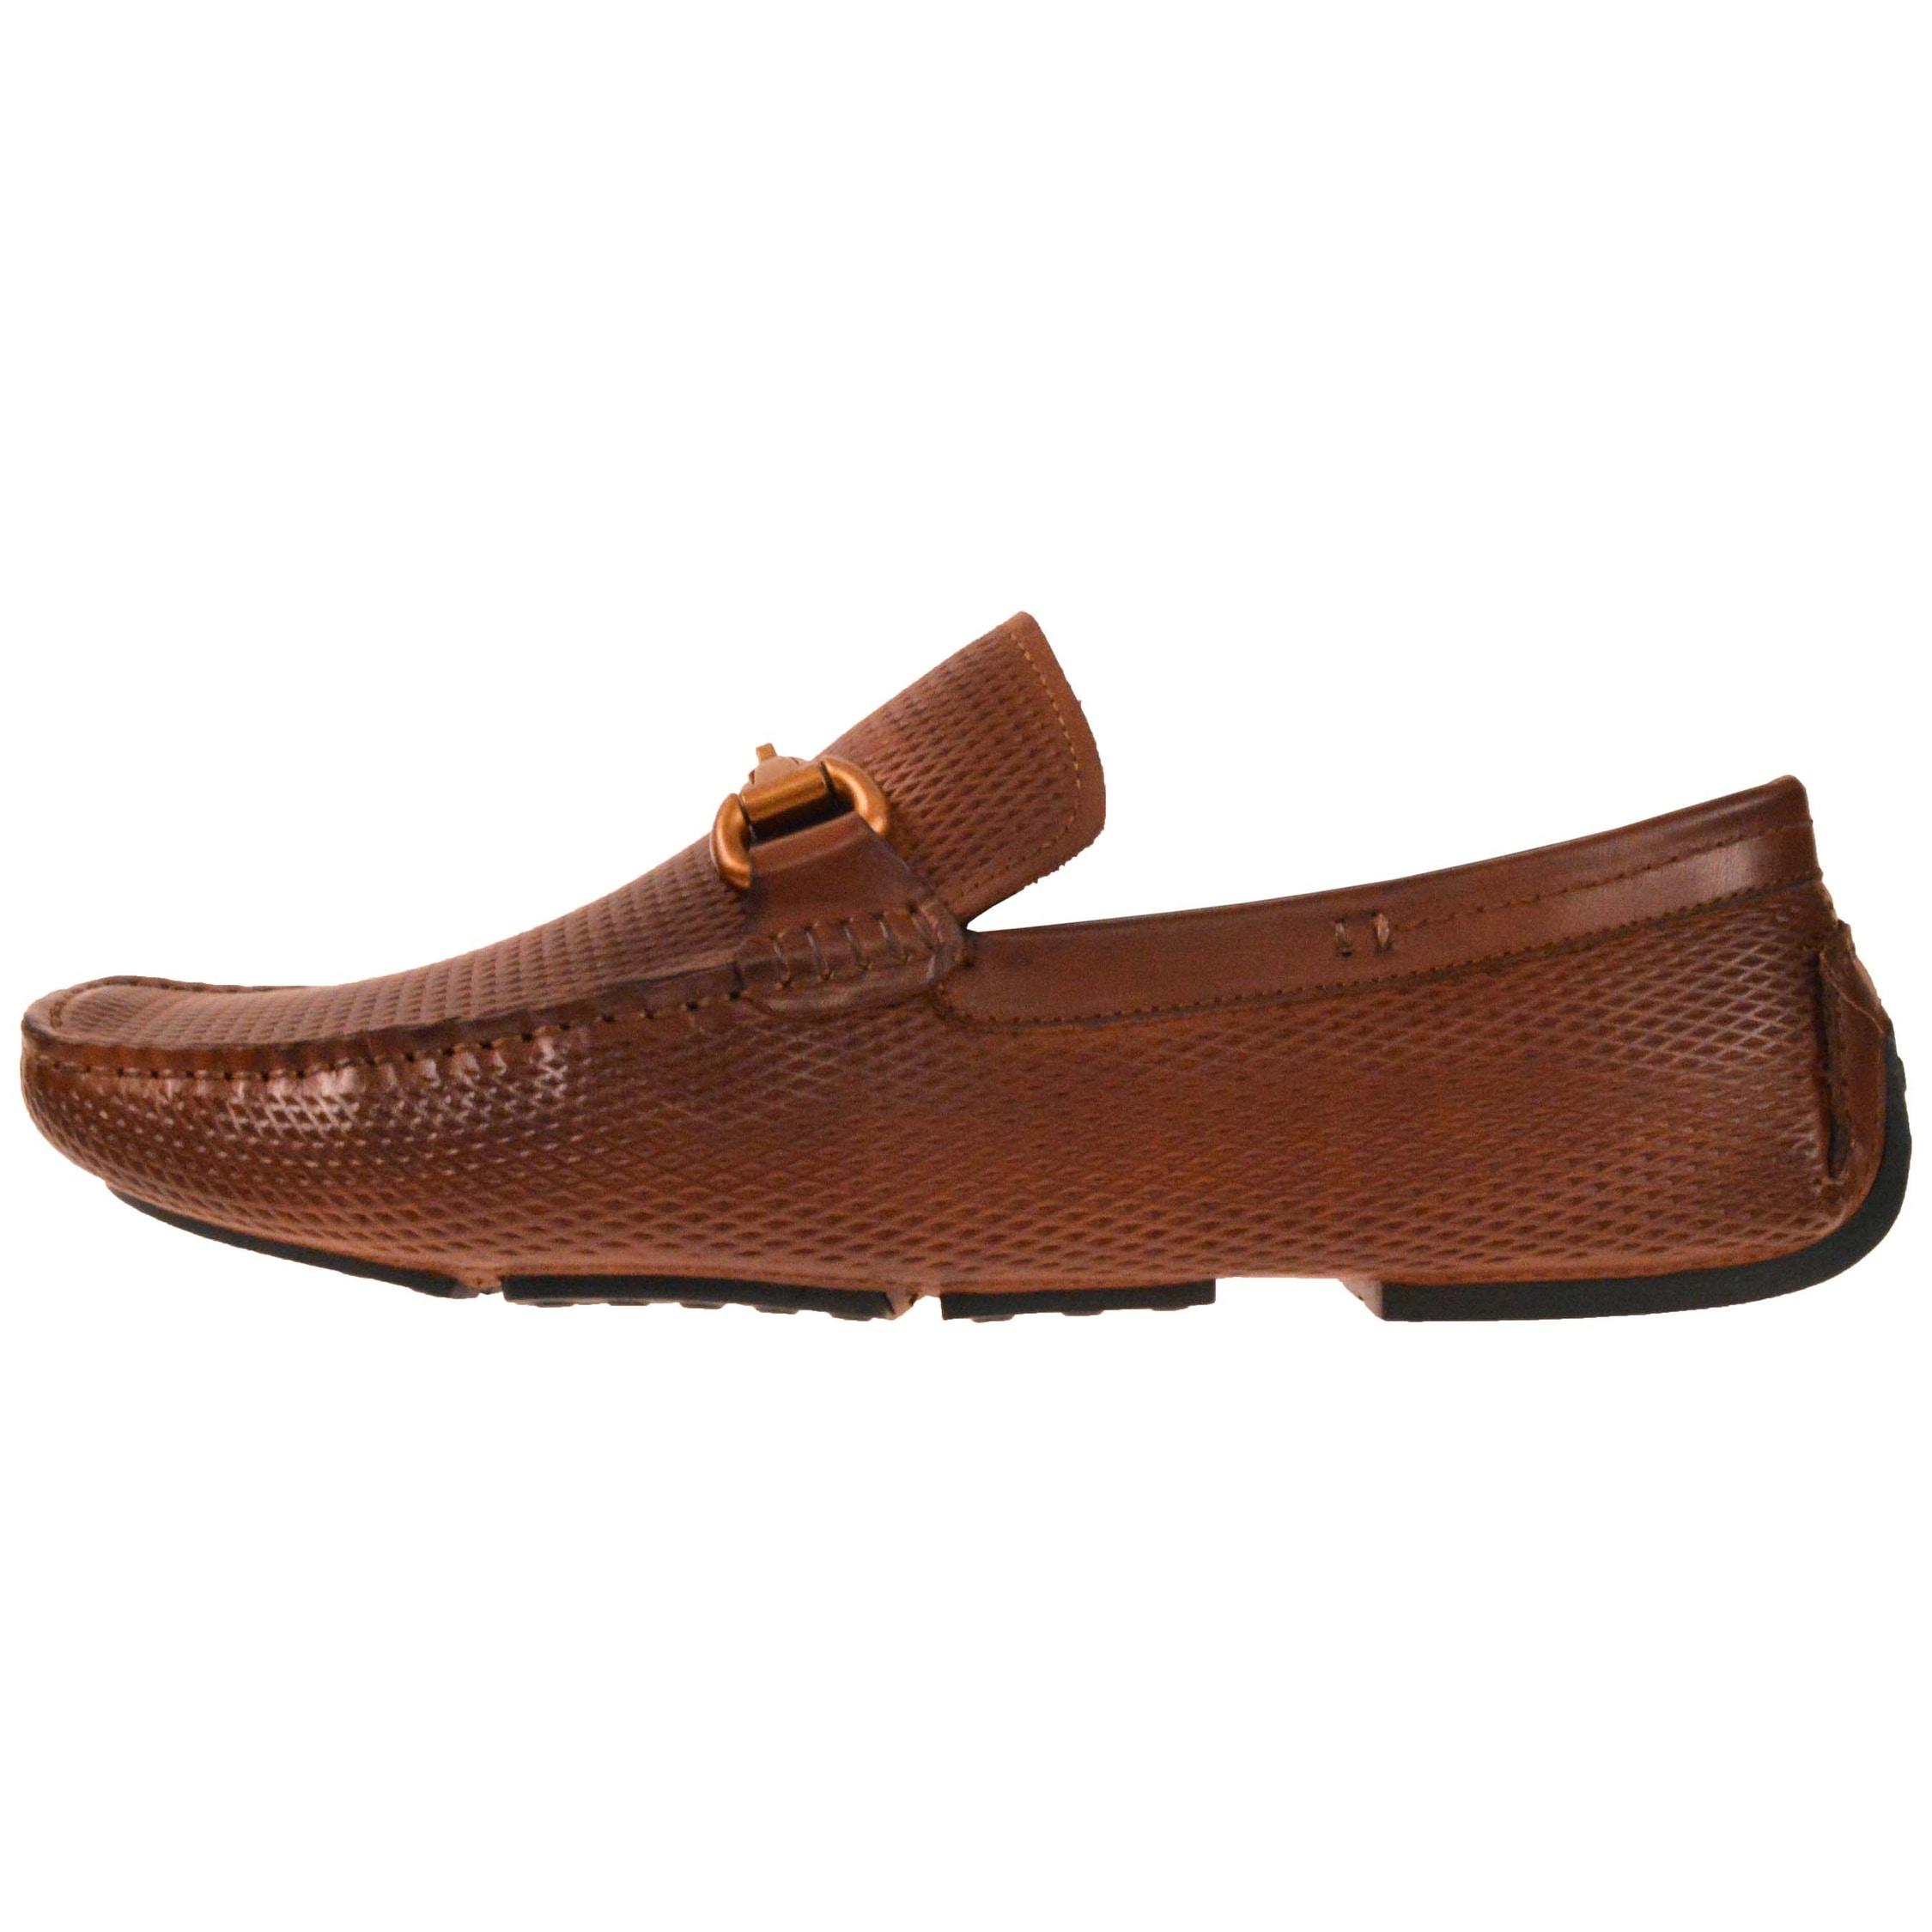 Asher Green Mens Cognac Genuine Leather Driving Shoe w//Diamond Emboss:AG8694-215